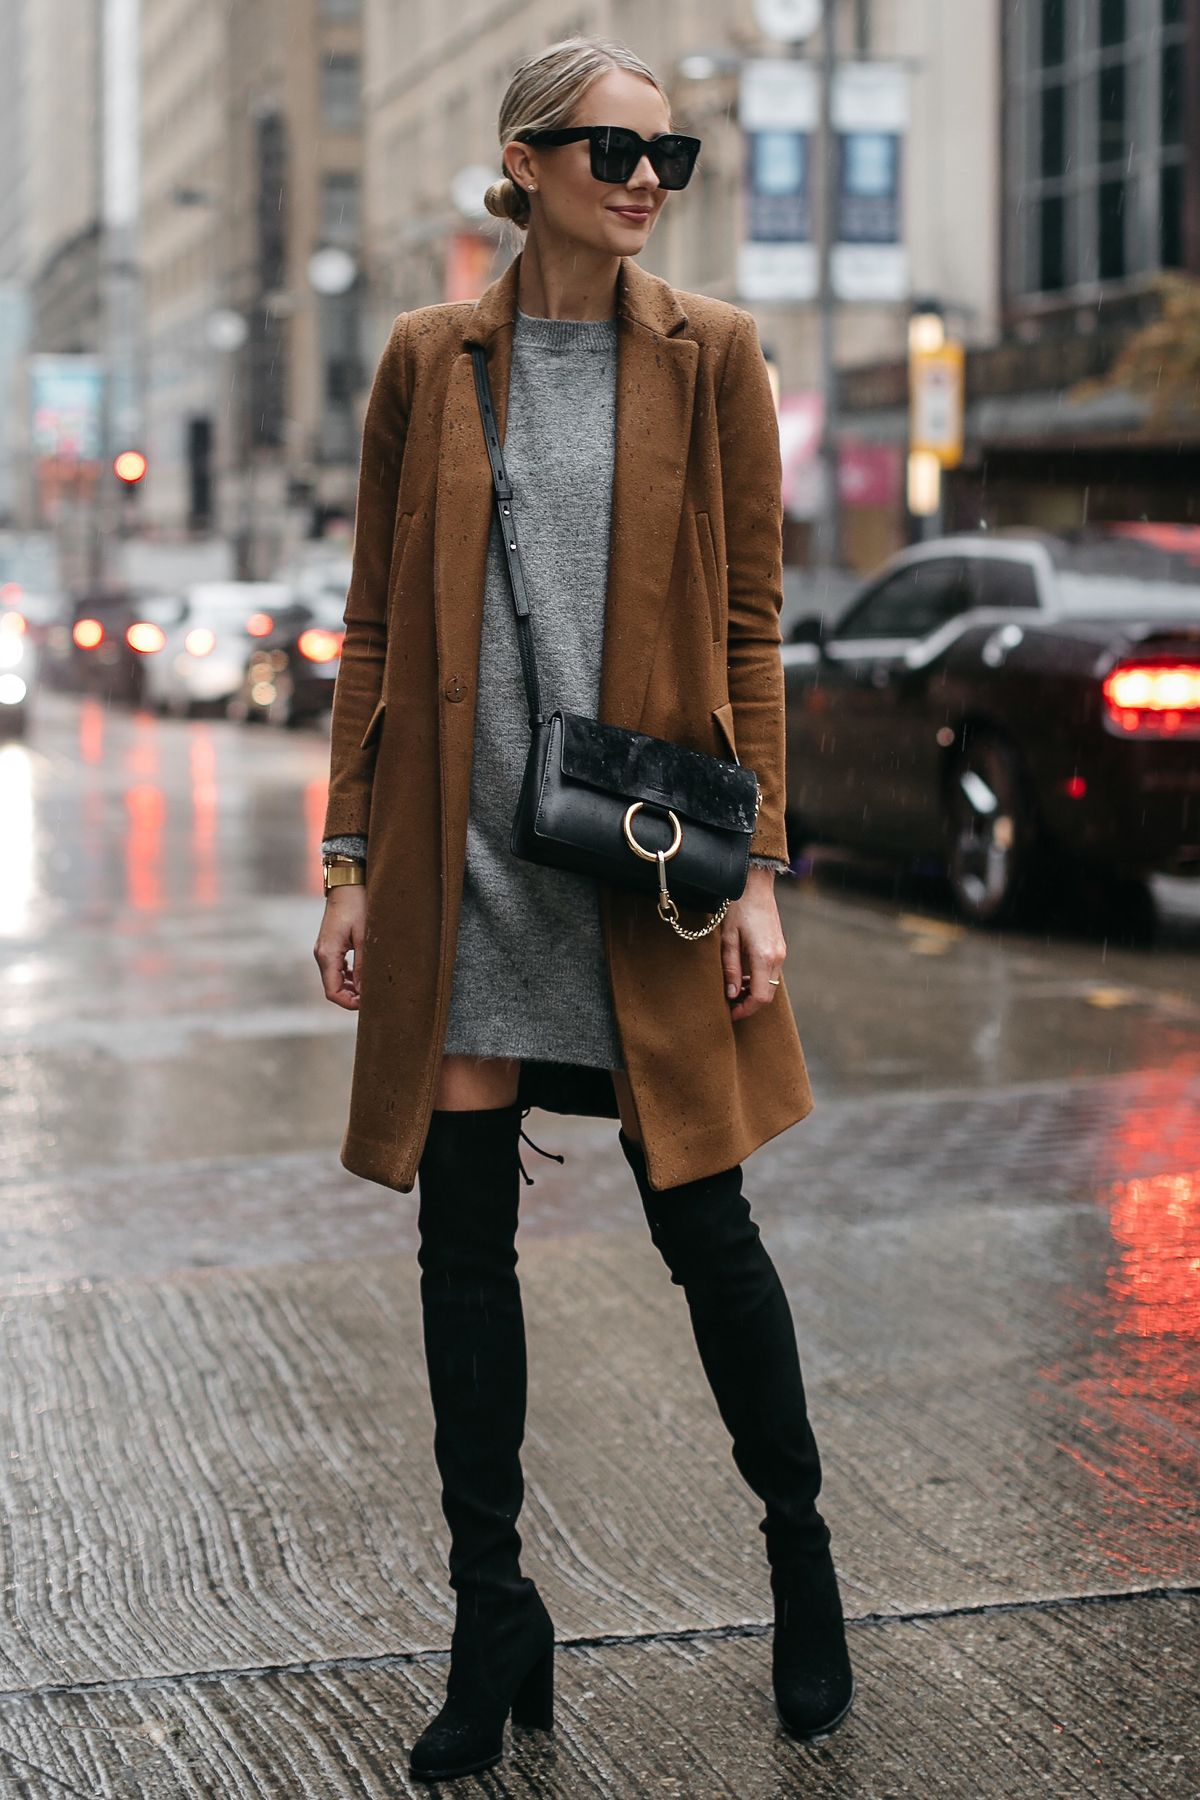 62e4da2770e8e Blonde Woman Wearing Zara Camel Wool Coat Topshop Grey Sweater Dress Chloe  Faye Handbag Stuart Weitzman Black Over the Knee Boots Fashion Jackson  Dallas ...